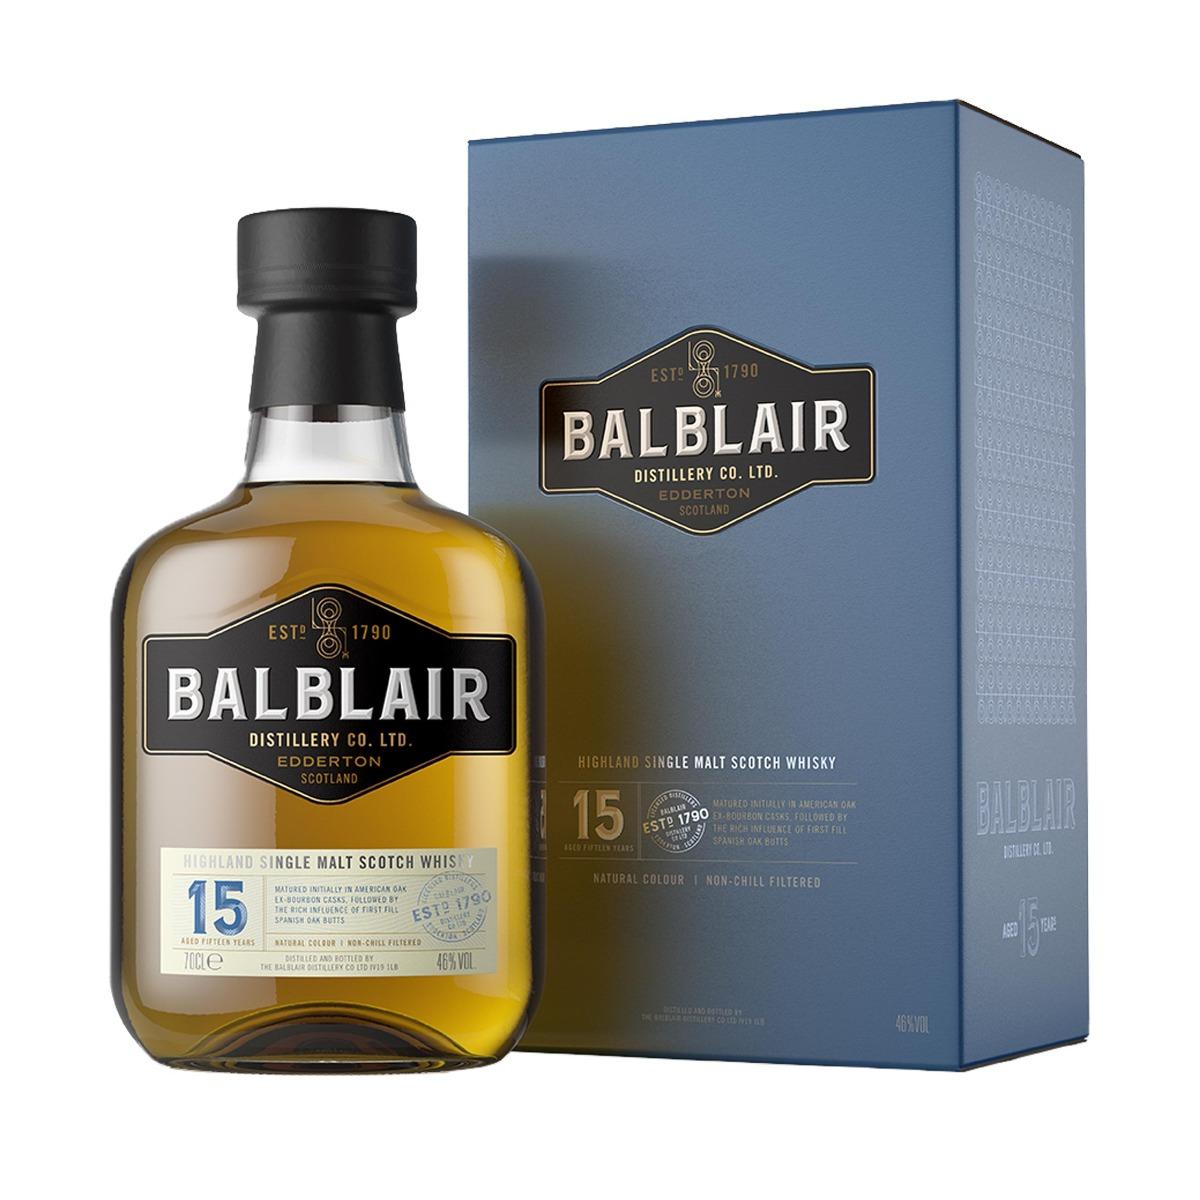 Balblair 15 Year Old Highland Single Malt Scotch Whisky 70cl